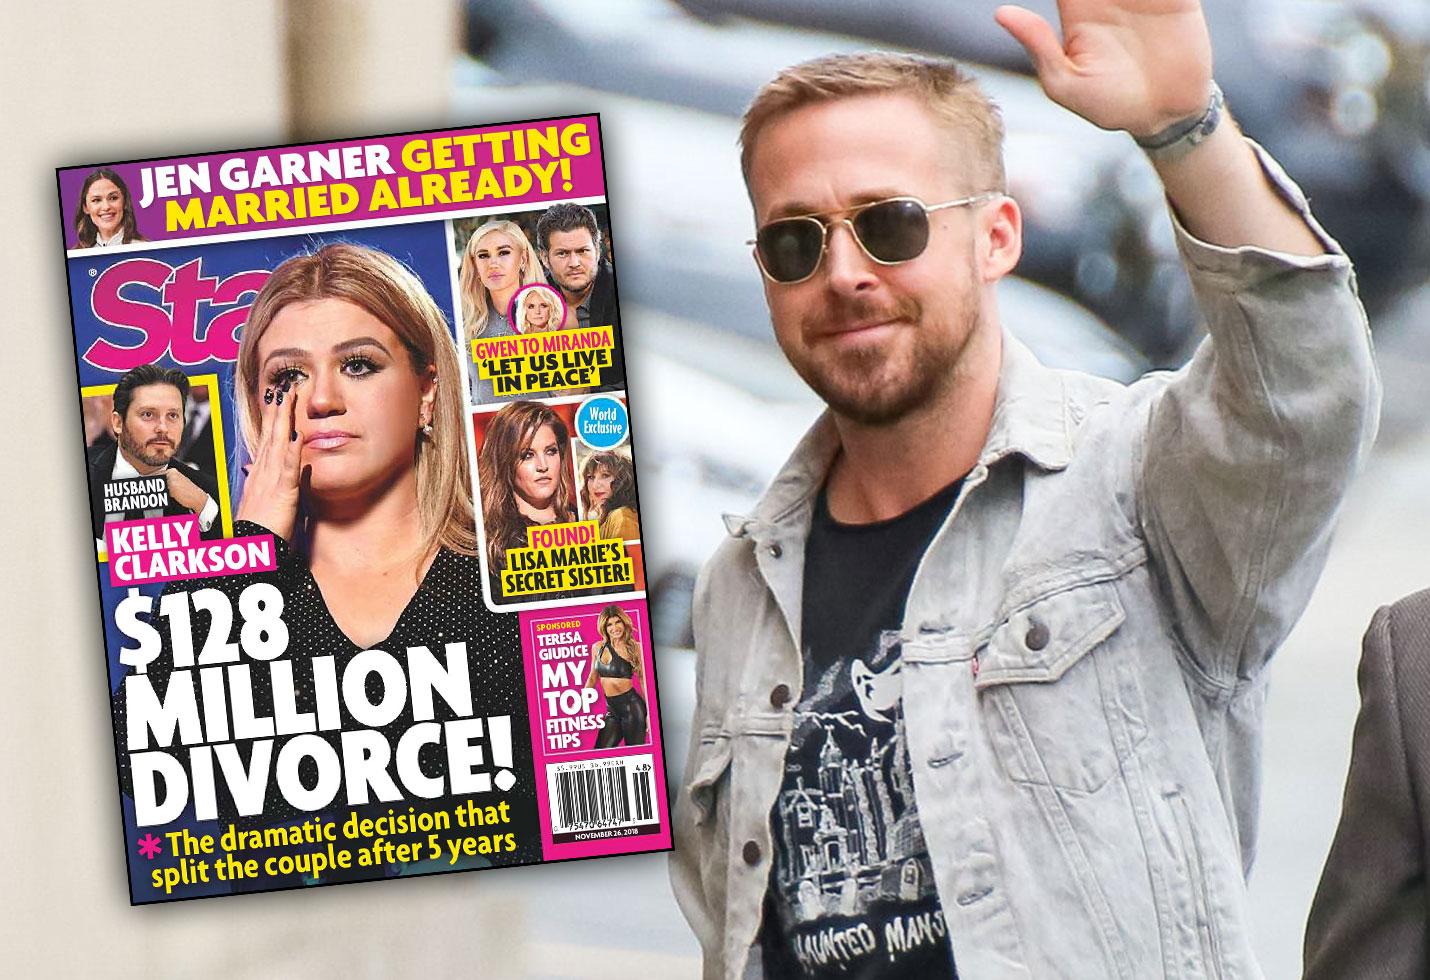 Eva Mendes Ryan Gosling Full-Frontal Nudity Movie Role Argument